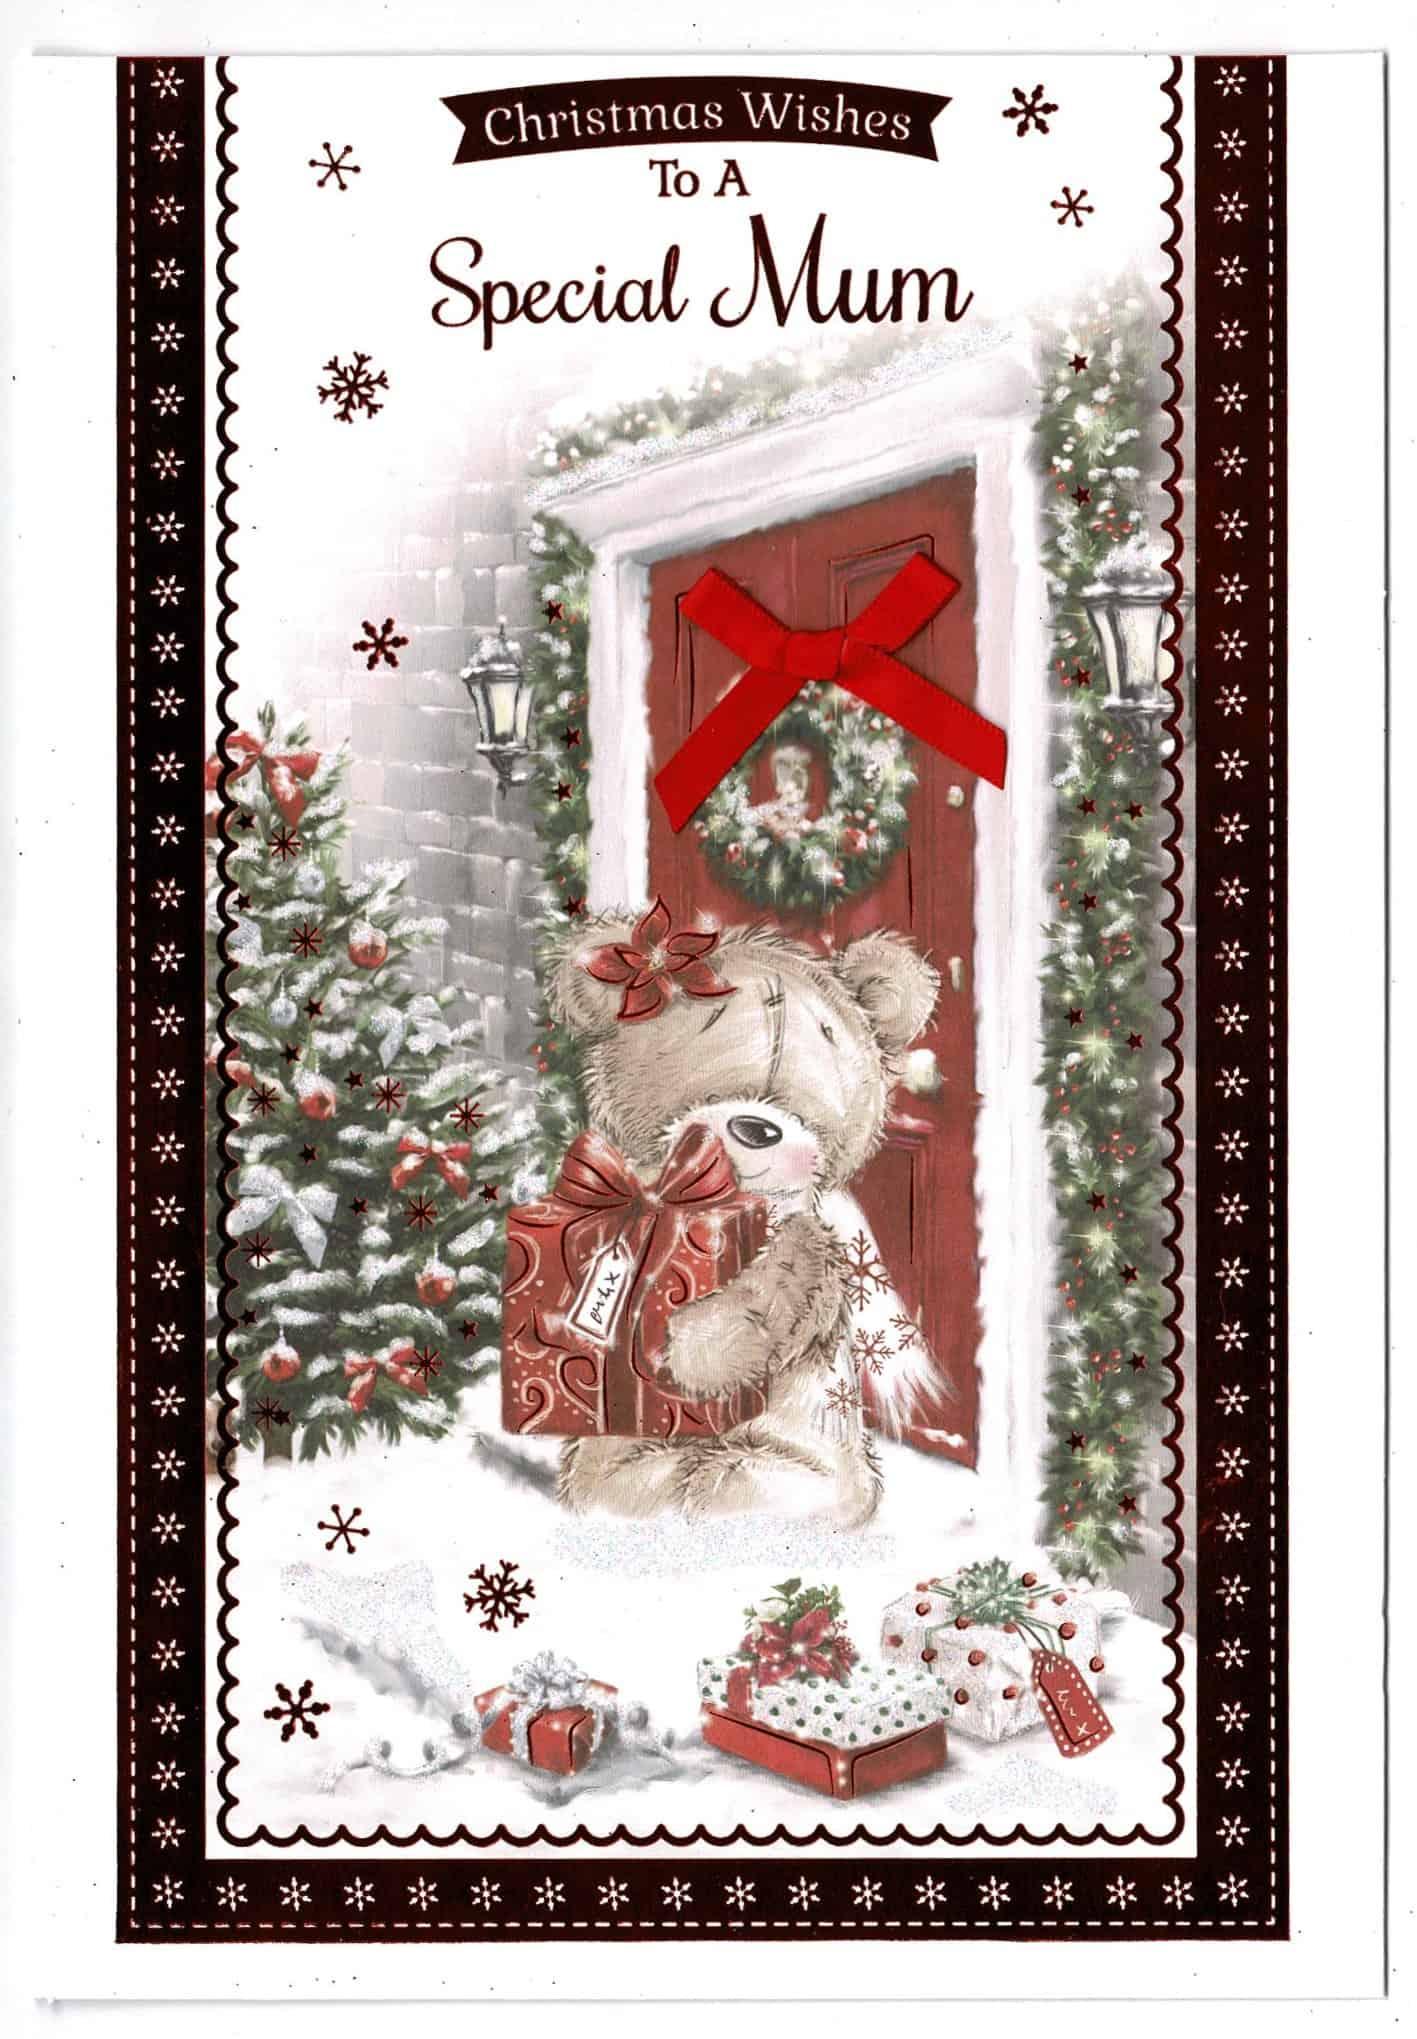 Christmas Card Design.Mum Christmas Card To A Special Mum Cute Teddy Bear Design